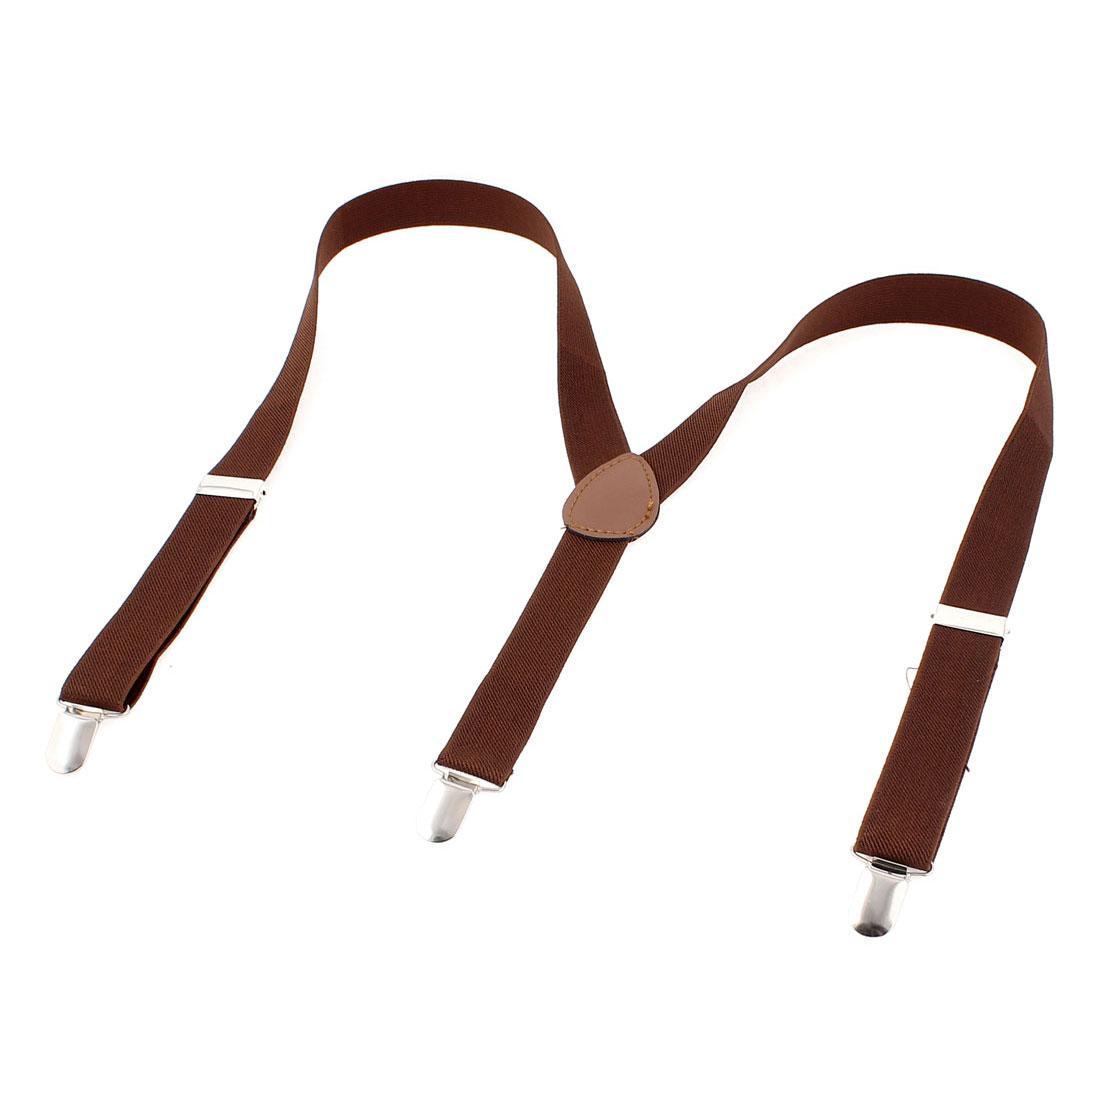 Adult Unisex Adjustable Metal Clamp Clip-on Elastic Y Shape Suspenders Braces Coffee Color